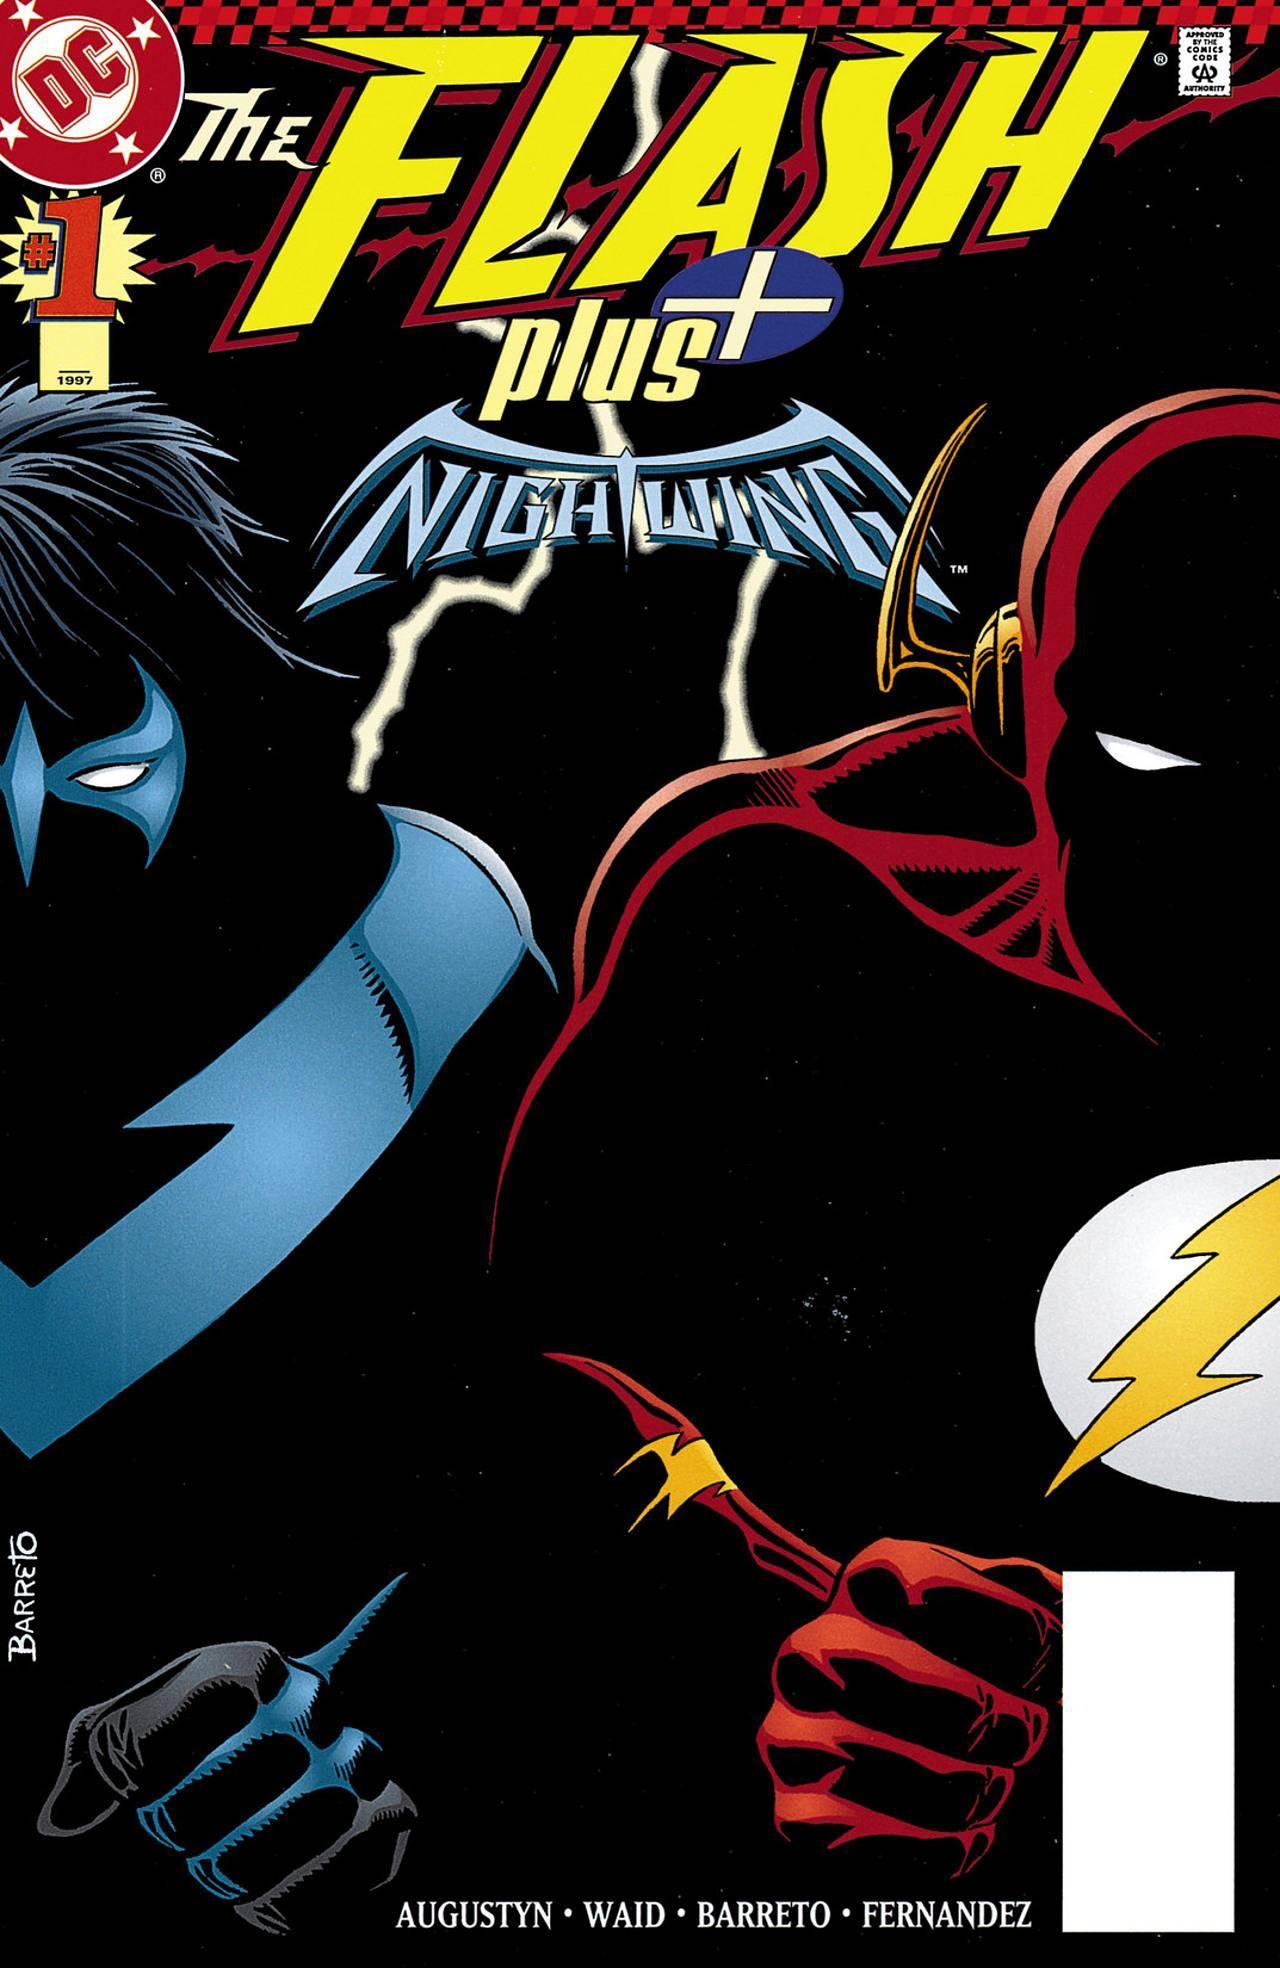 Flash 1997-09 Flash Plus Nightwing 001 digital with LP